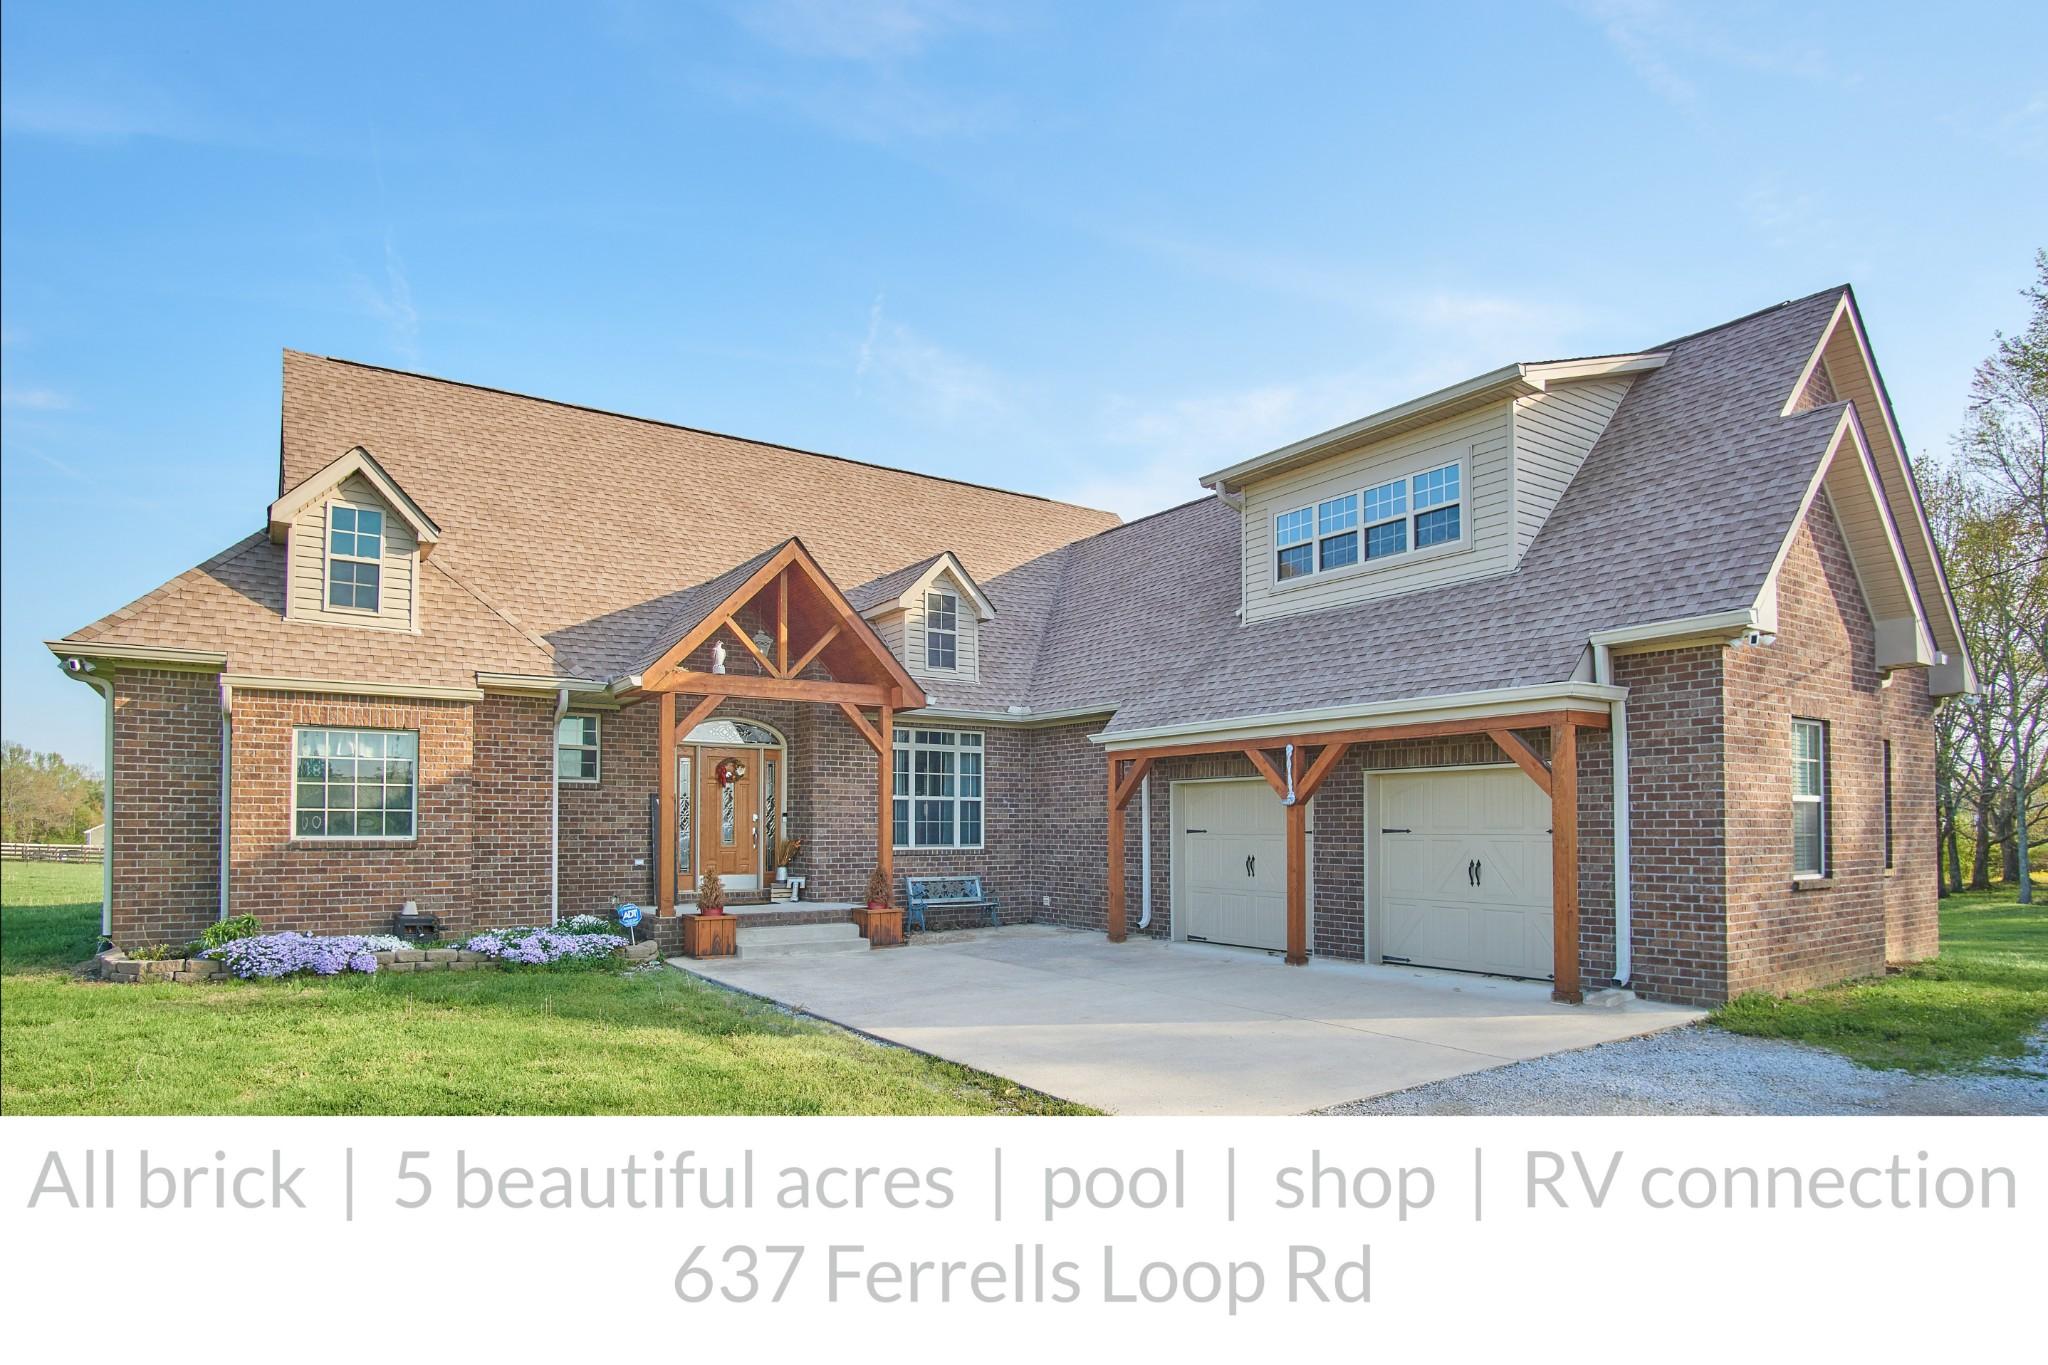 637 Ferrells Loop Rd Property Photo - Beechgrove, TN real estate listing